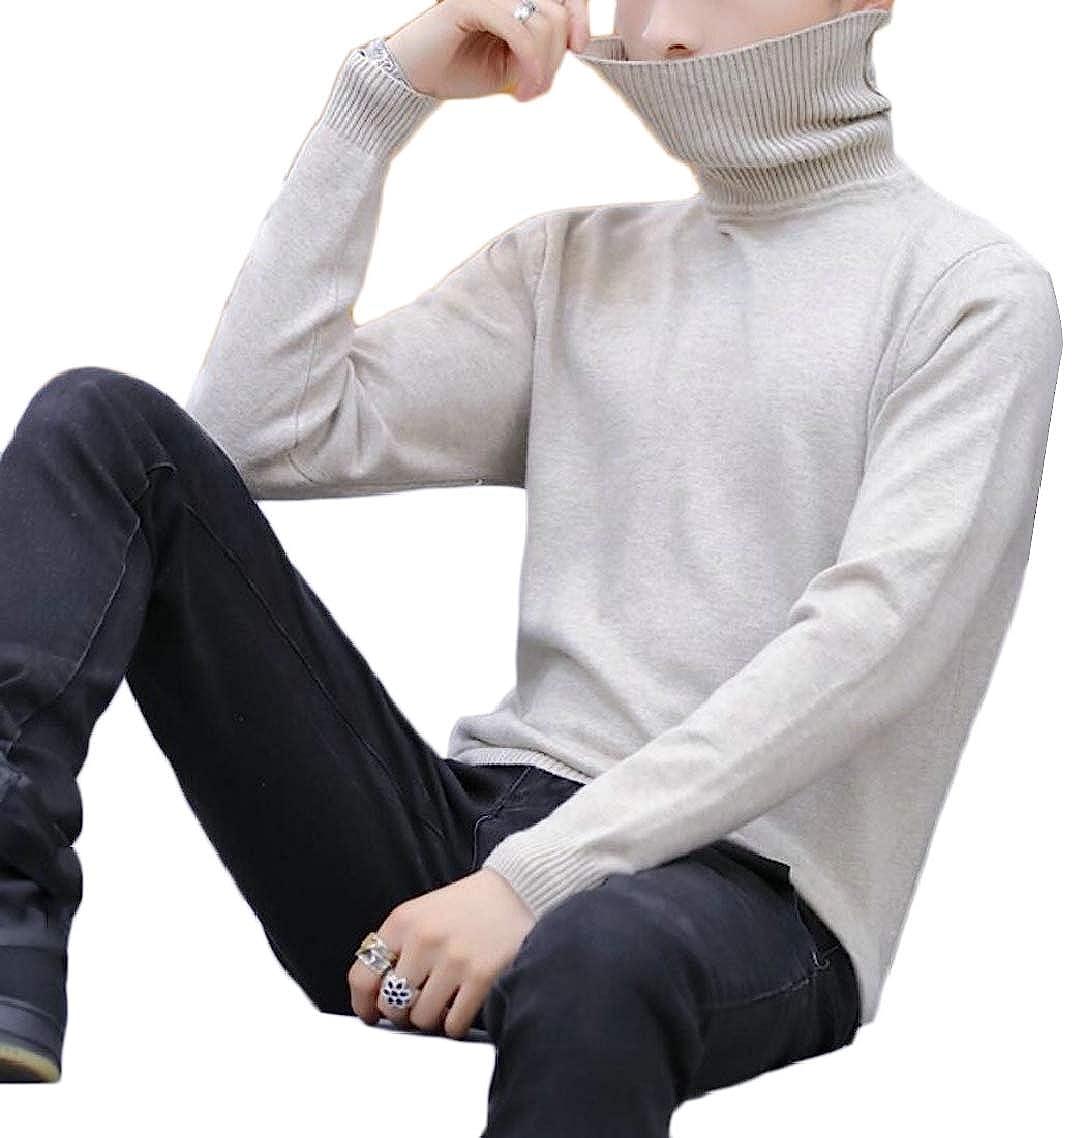 Gocgt Mens Turtleneck Top Long Sleeves Knitted Sweater